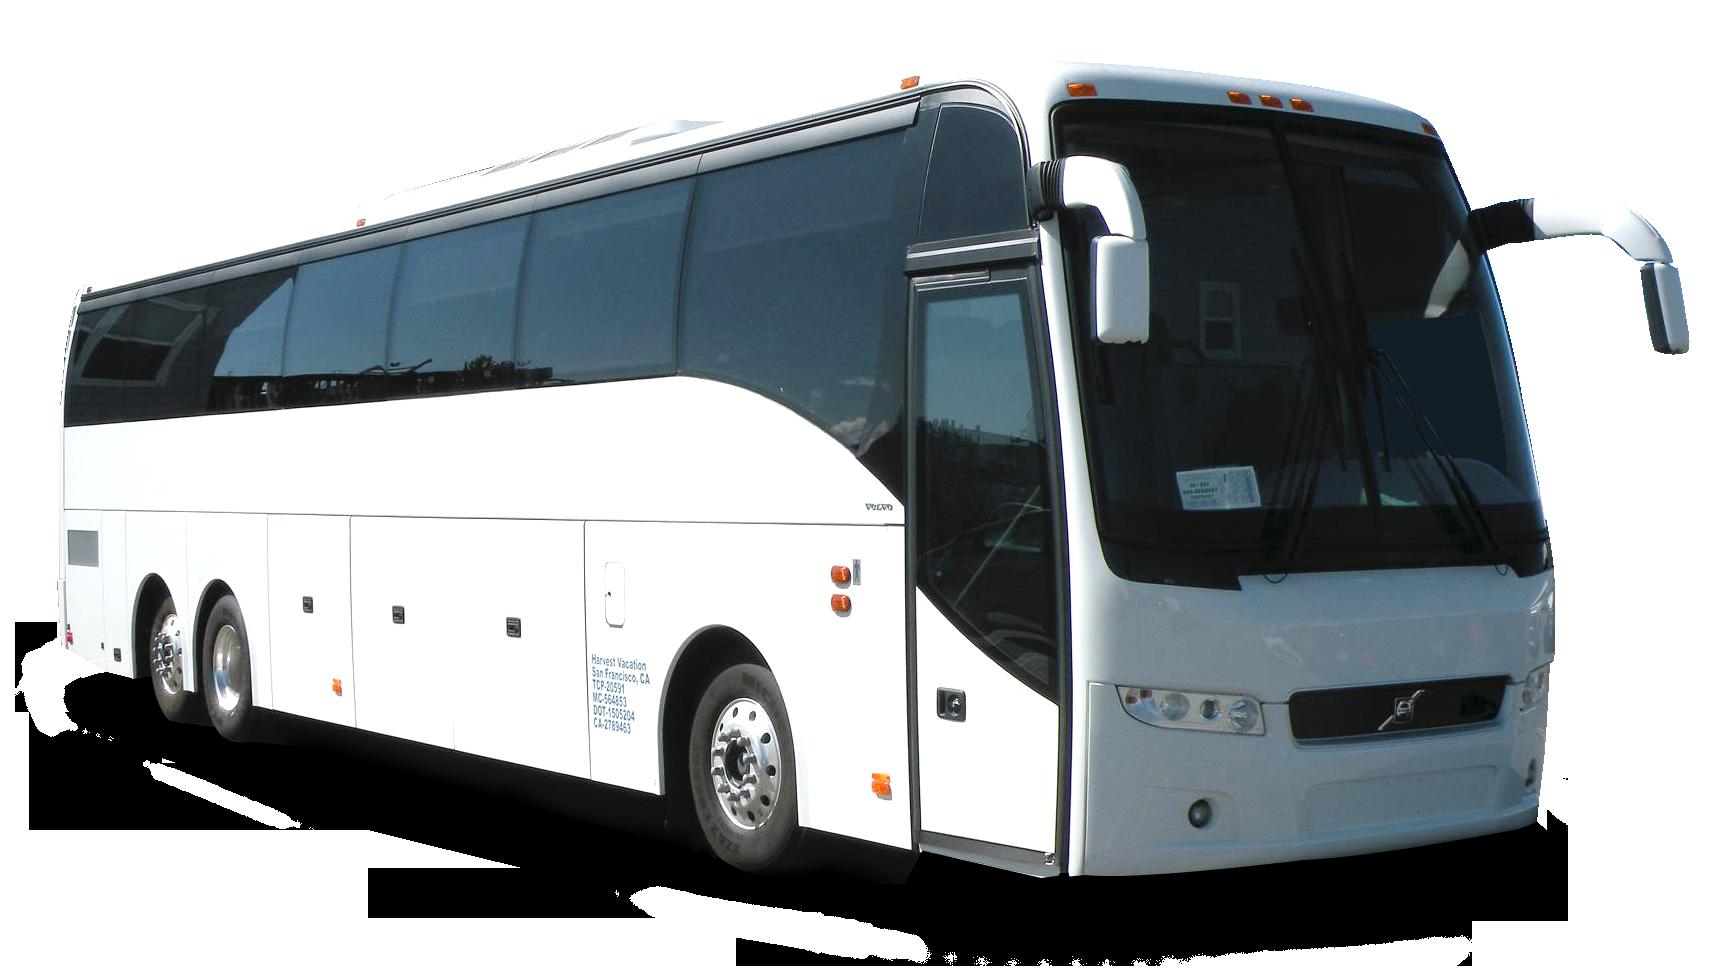 . PlusPng.com bus-png-4.png PlusPng.com  - PNG Tour Bus